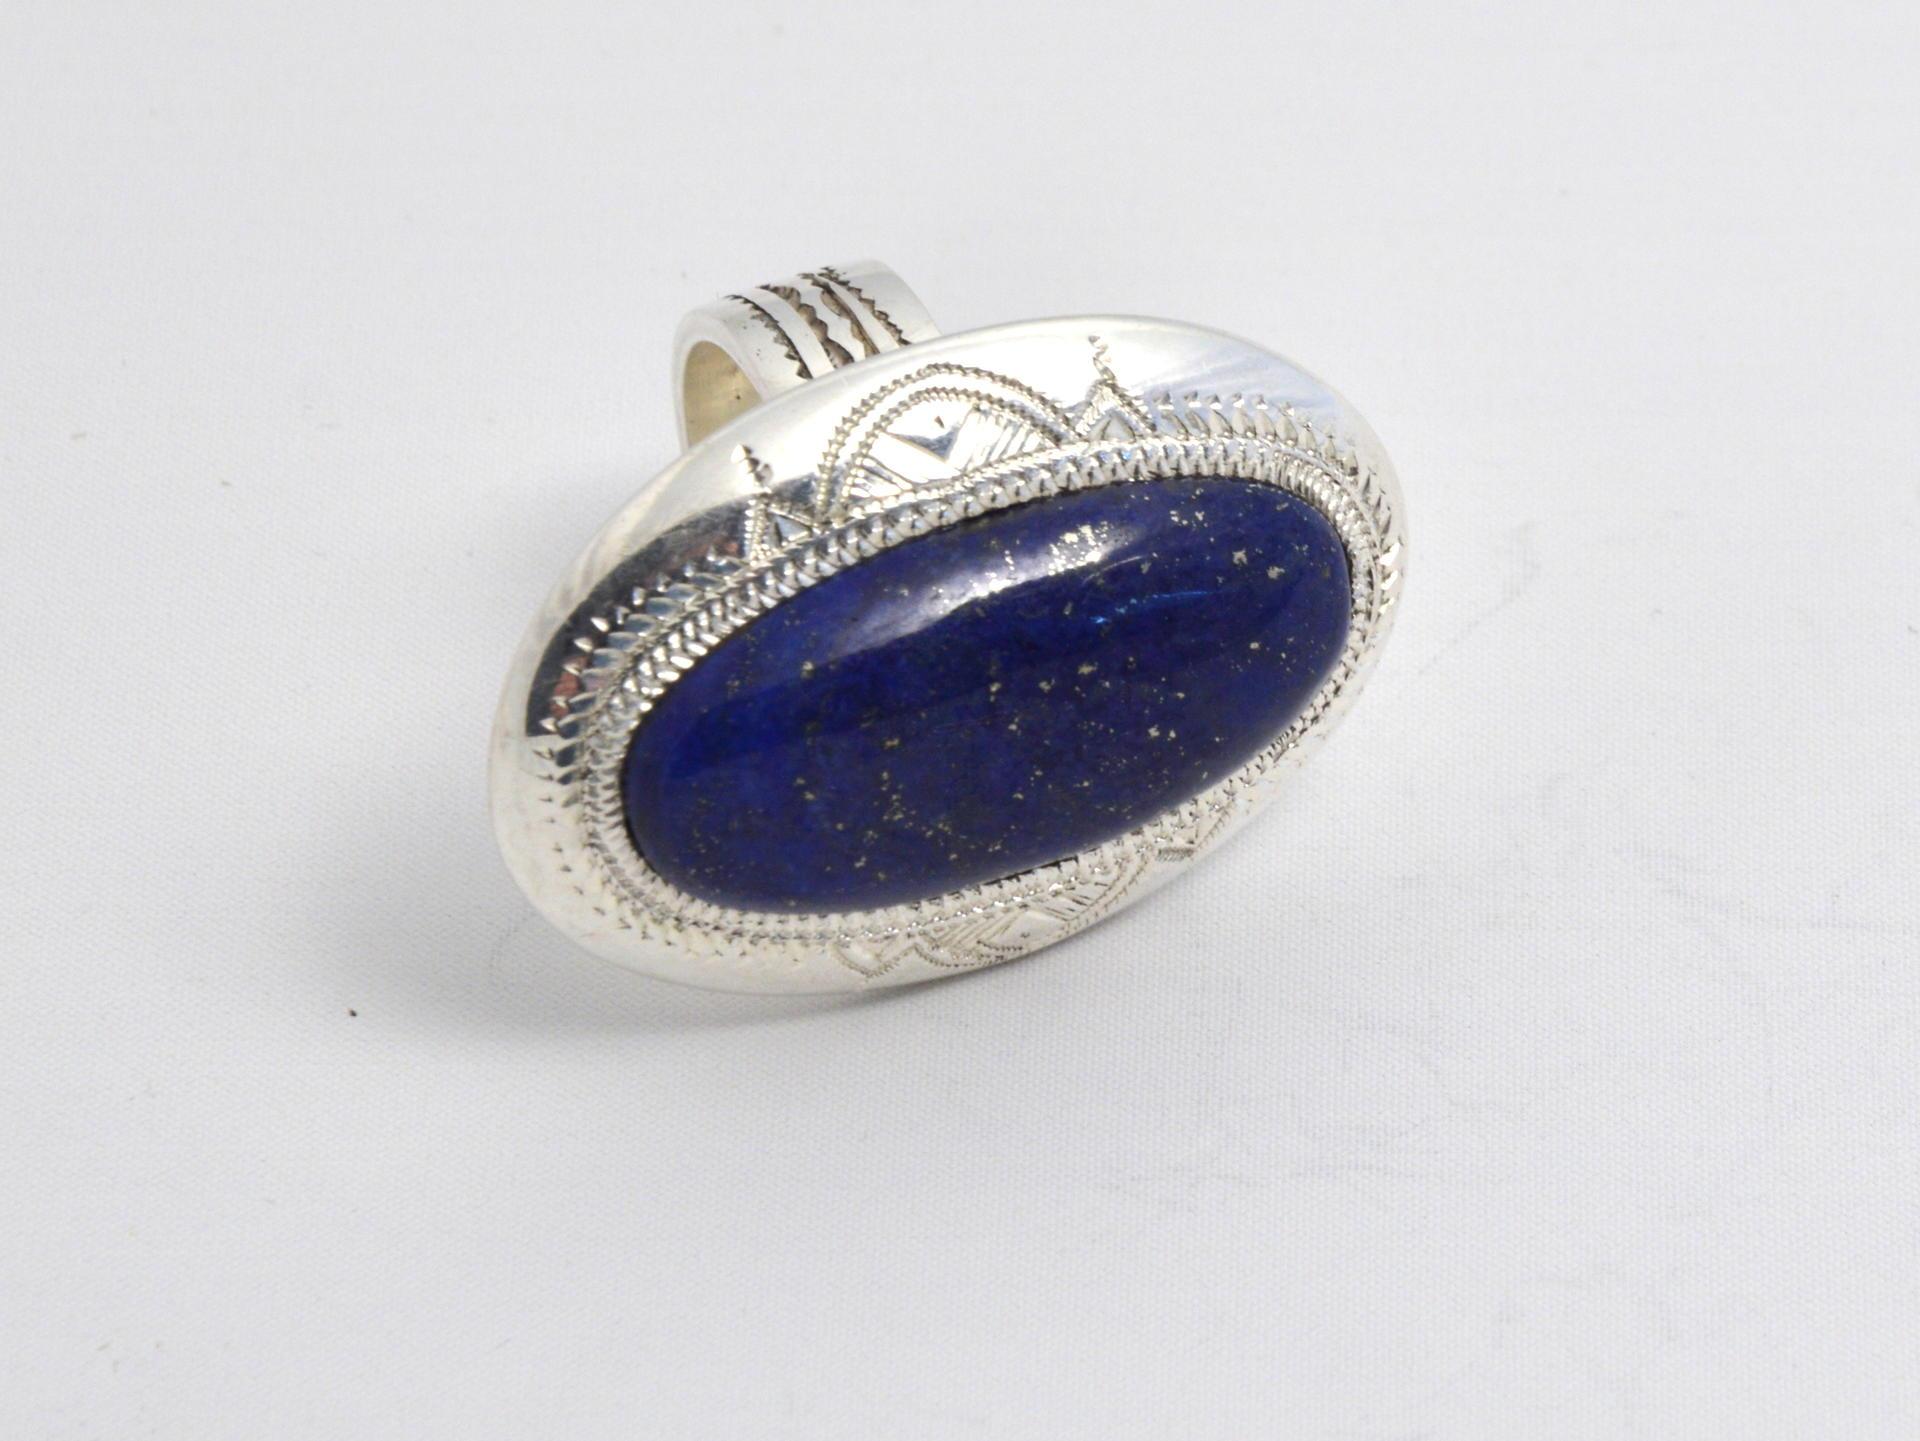 bague argent lapis lazuli tehnat gundara. Black Bedroom Furniture Sets. Home Design Ideas